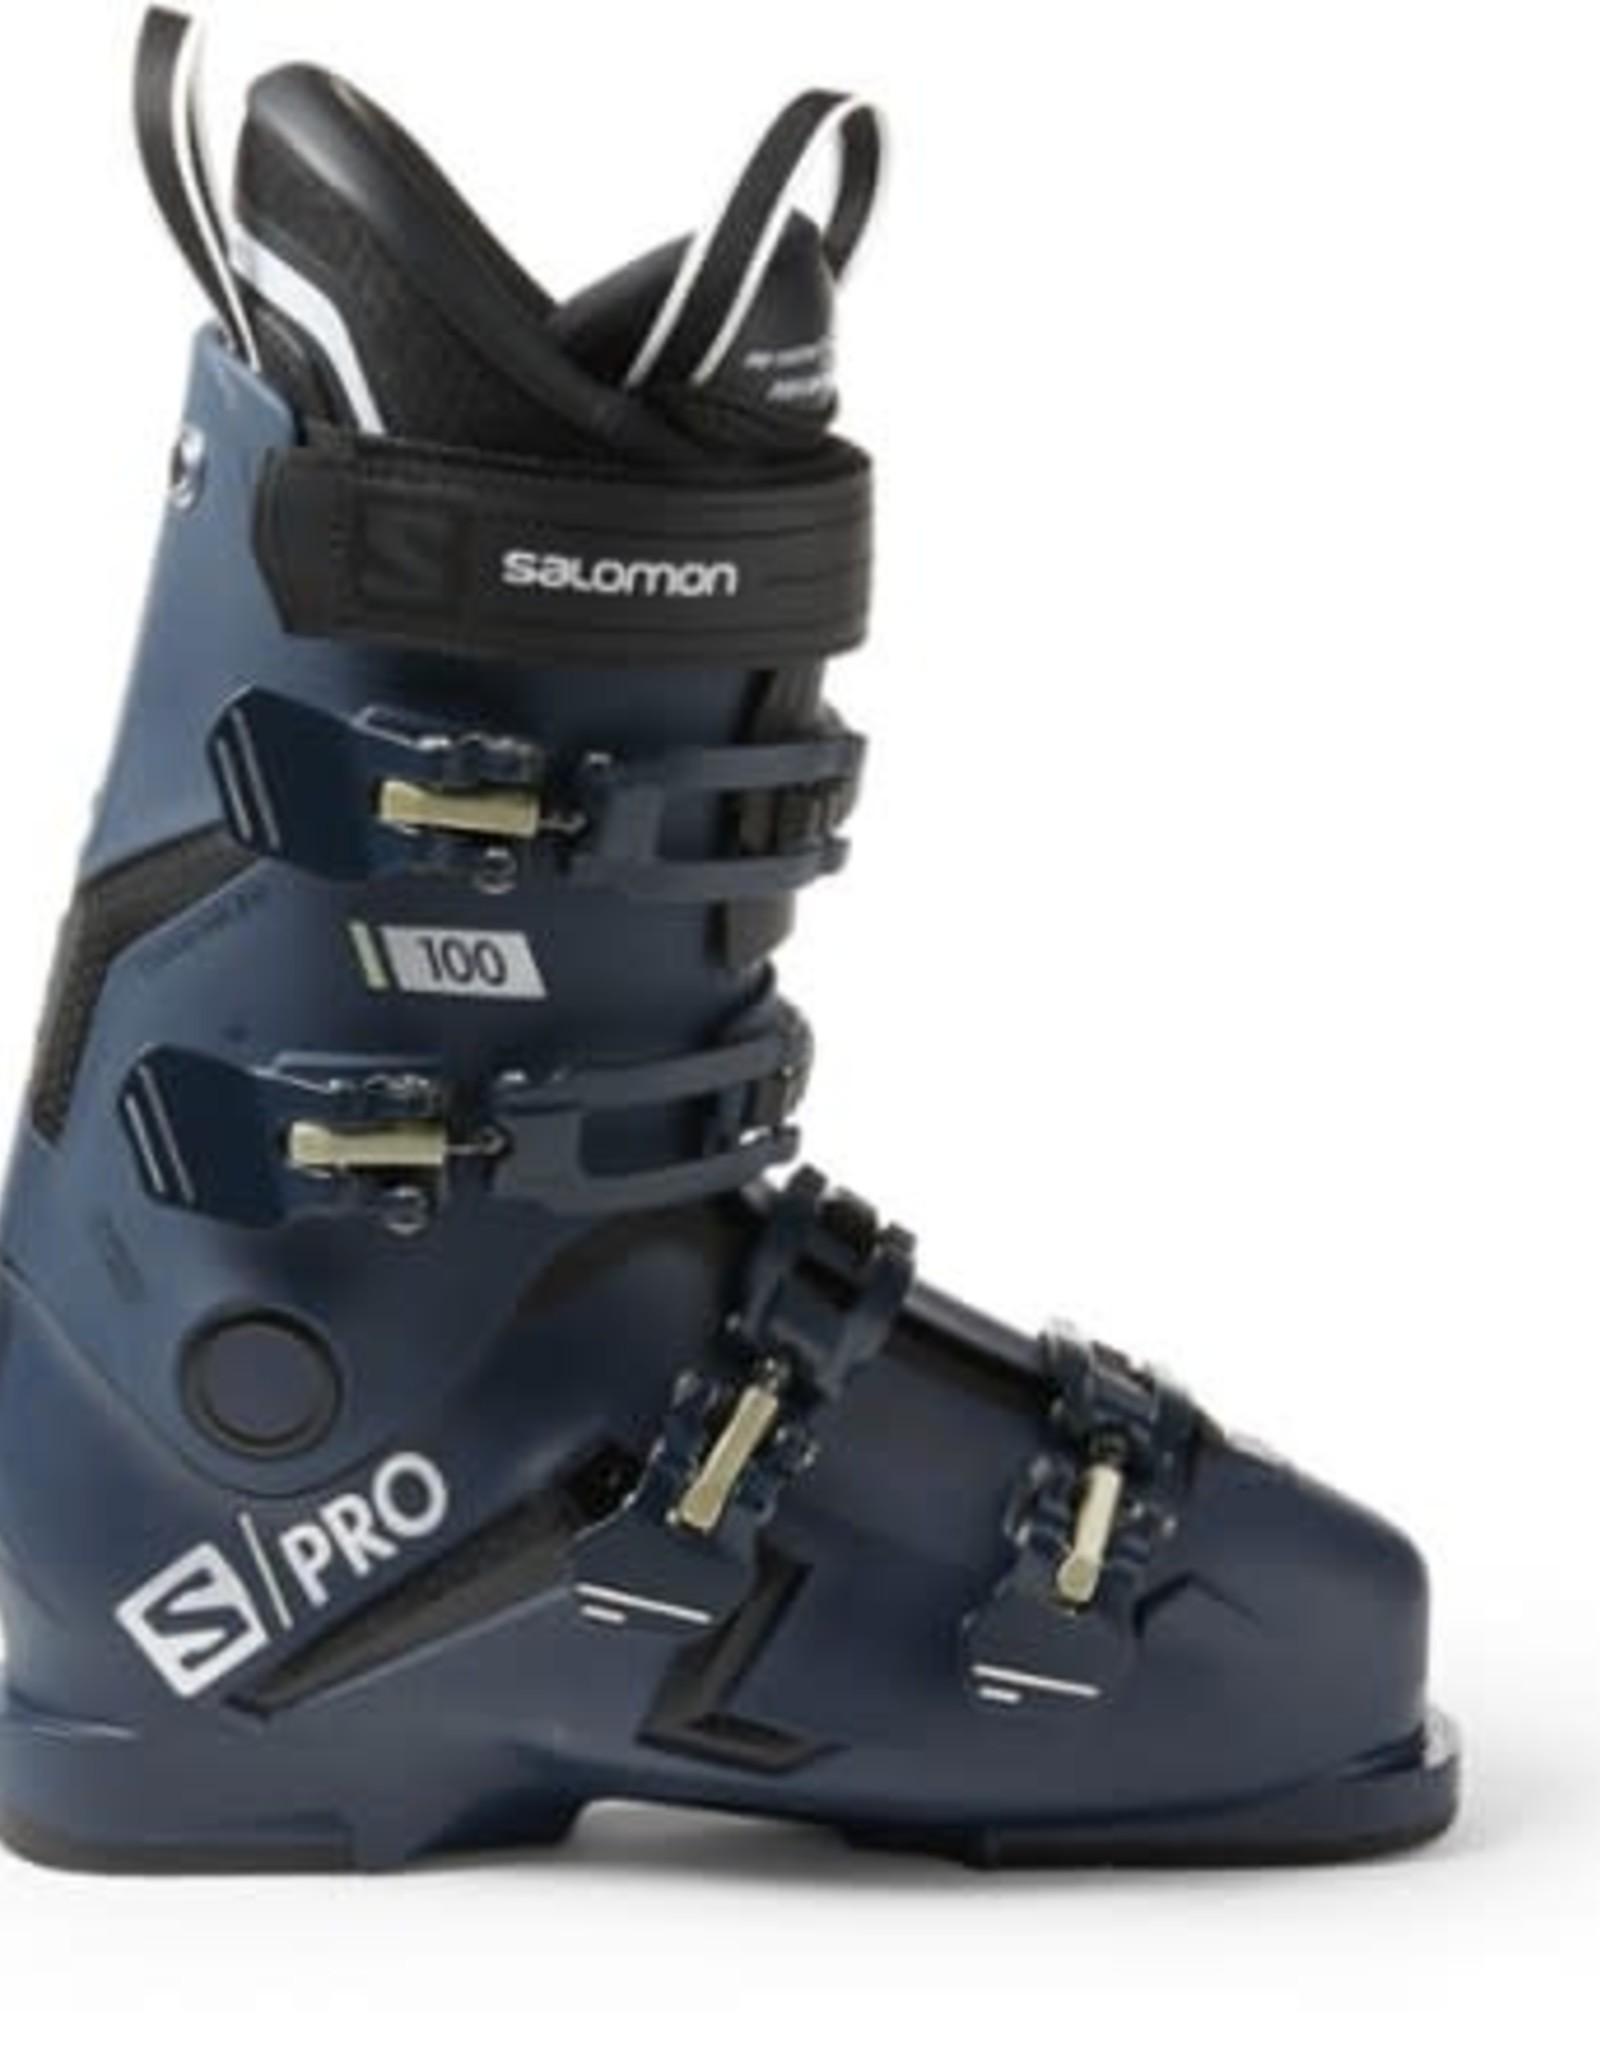 Salomon SALOMON Ski Boots S/PRO 100 (20/21)